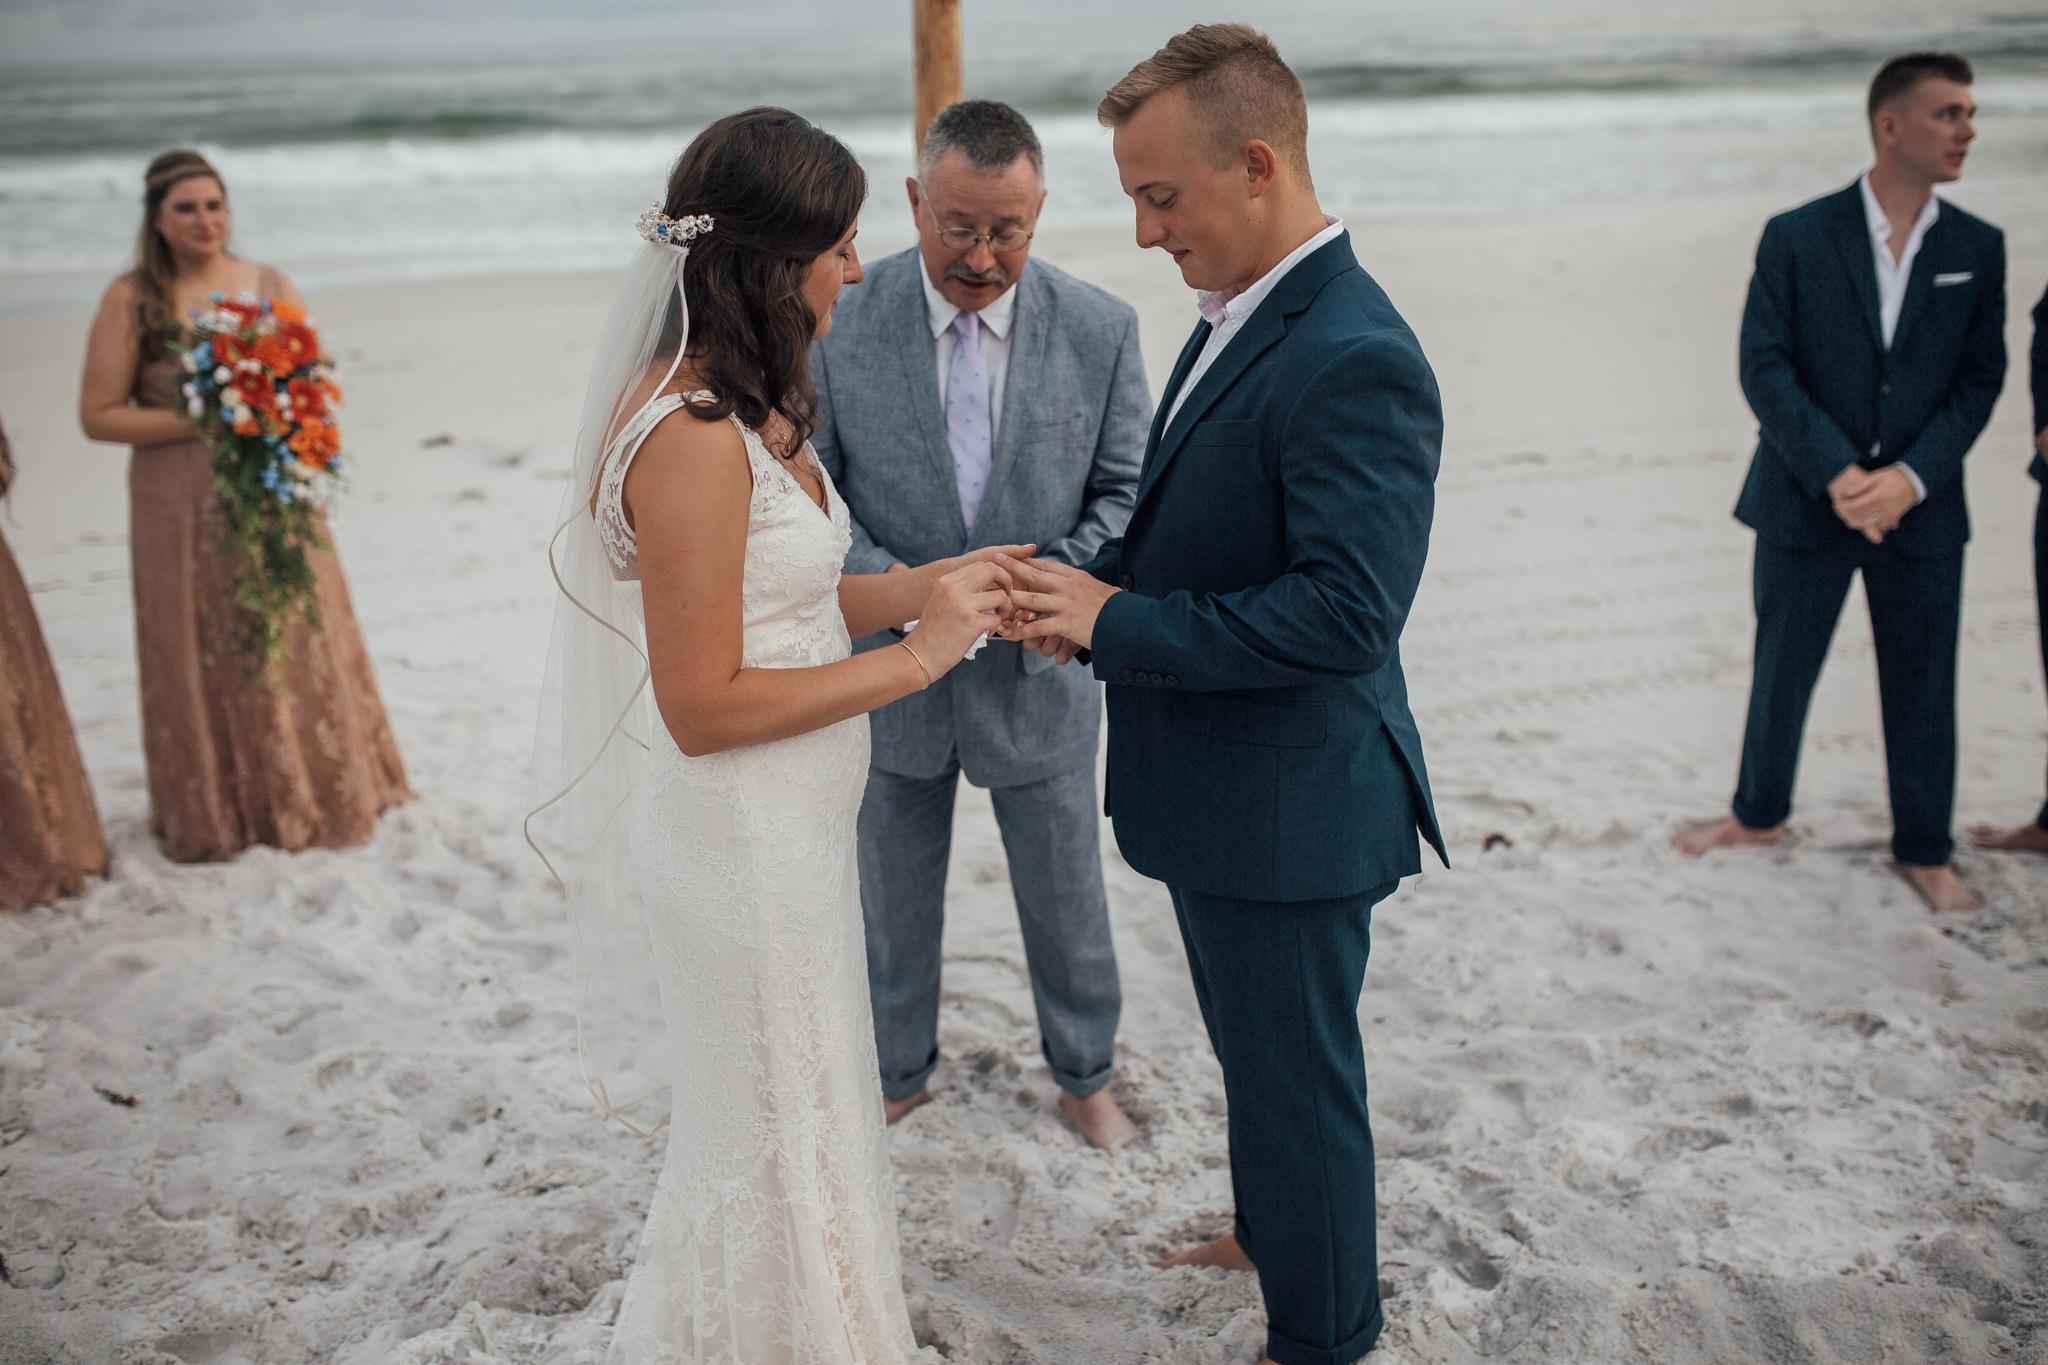 cassie-cook-photography-santa-rosa-beach-wedding-farrar-wedding-70.jpg